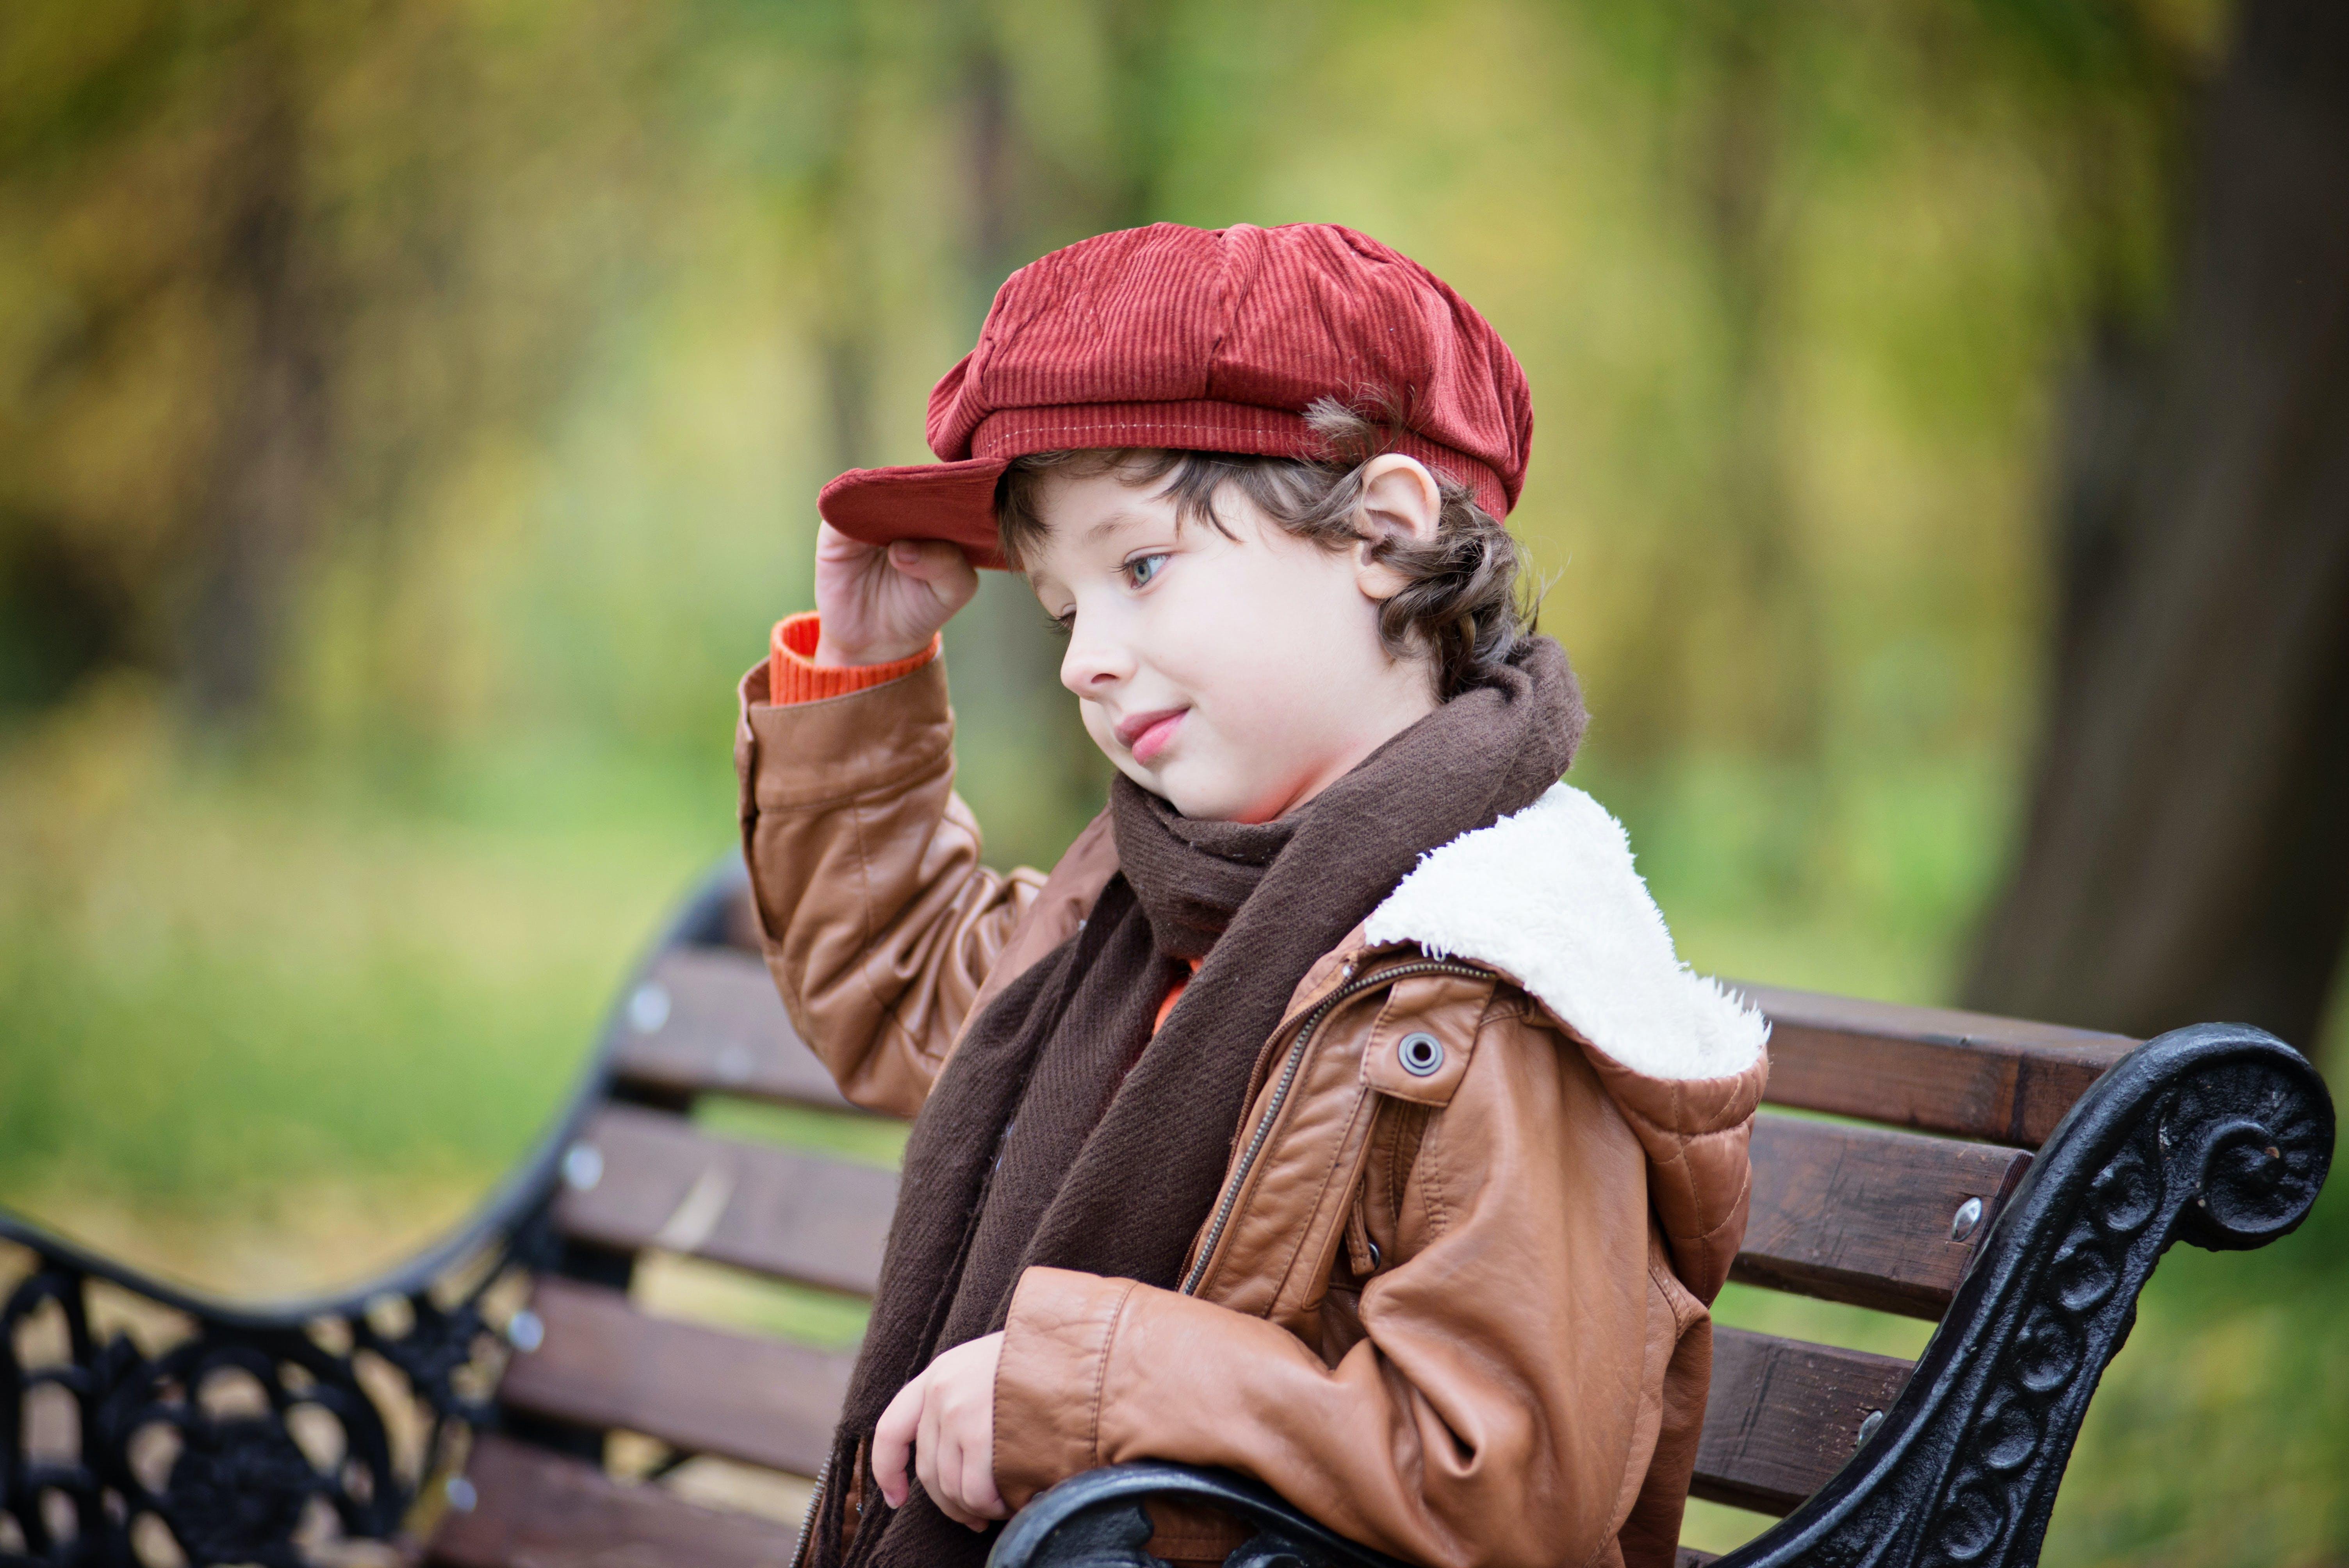 Boy Wearing Red Beret Cap While Sitting on Bench